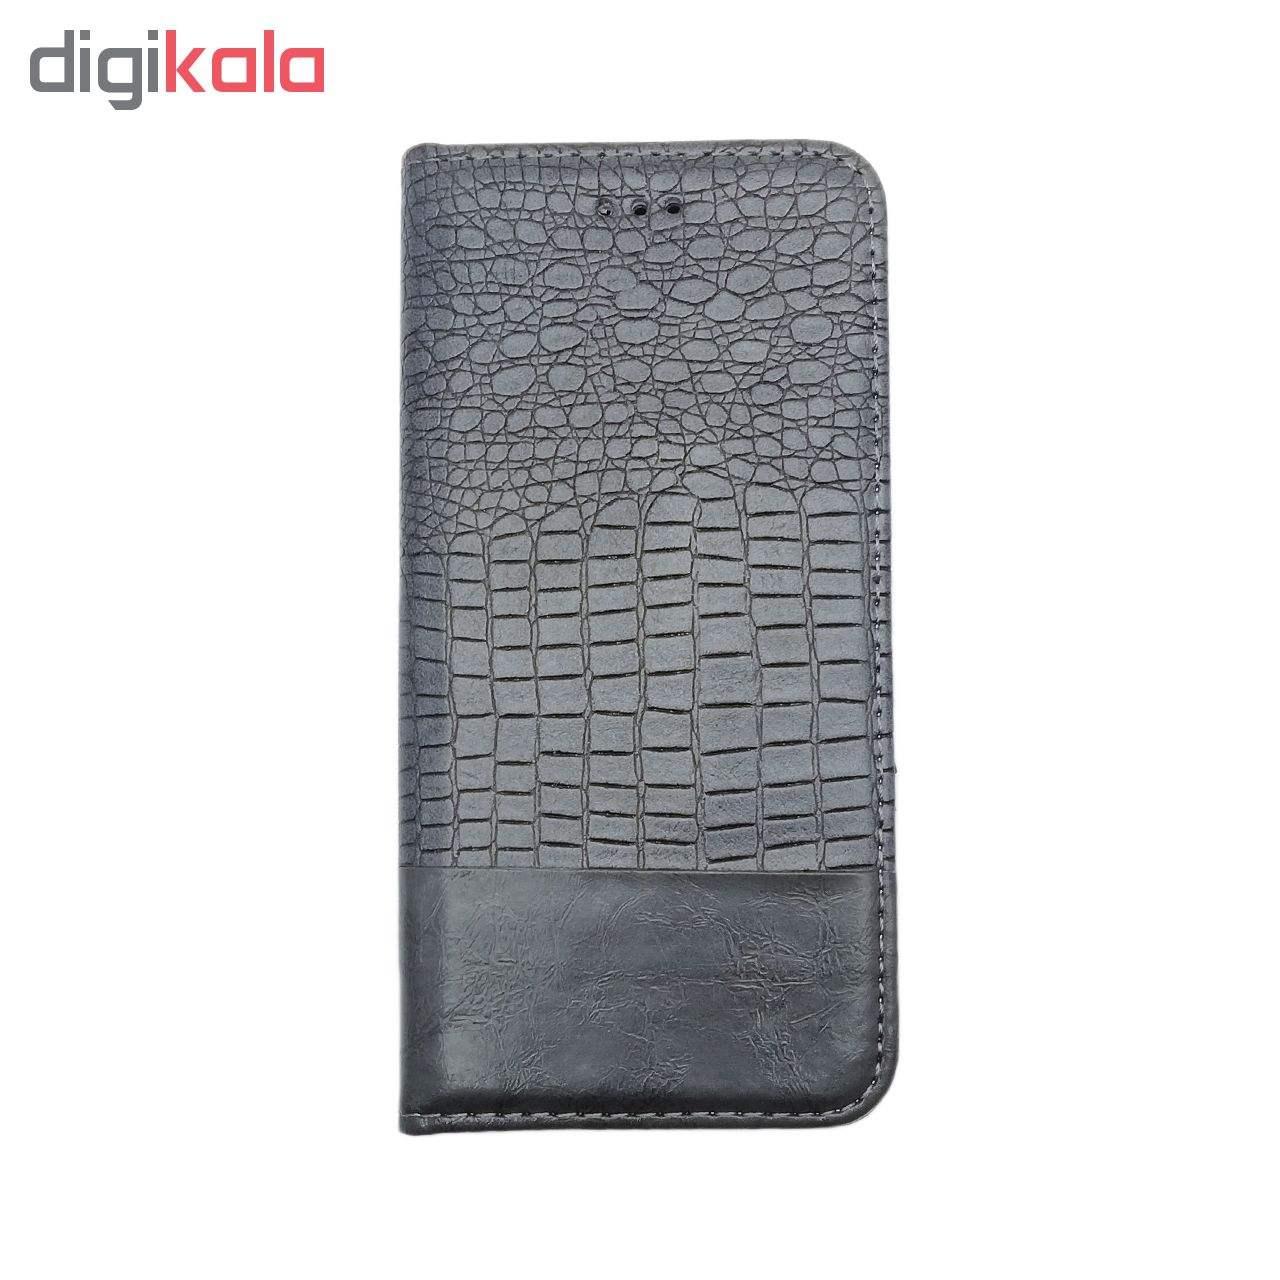 کیف کلاسوری مدل A2 مناسب برای گوشی موبایل اپل iphone 7/8 main 1 1